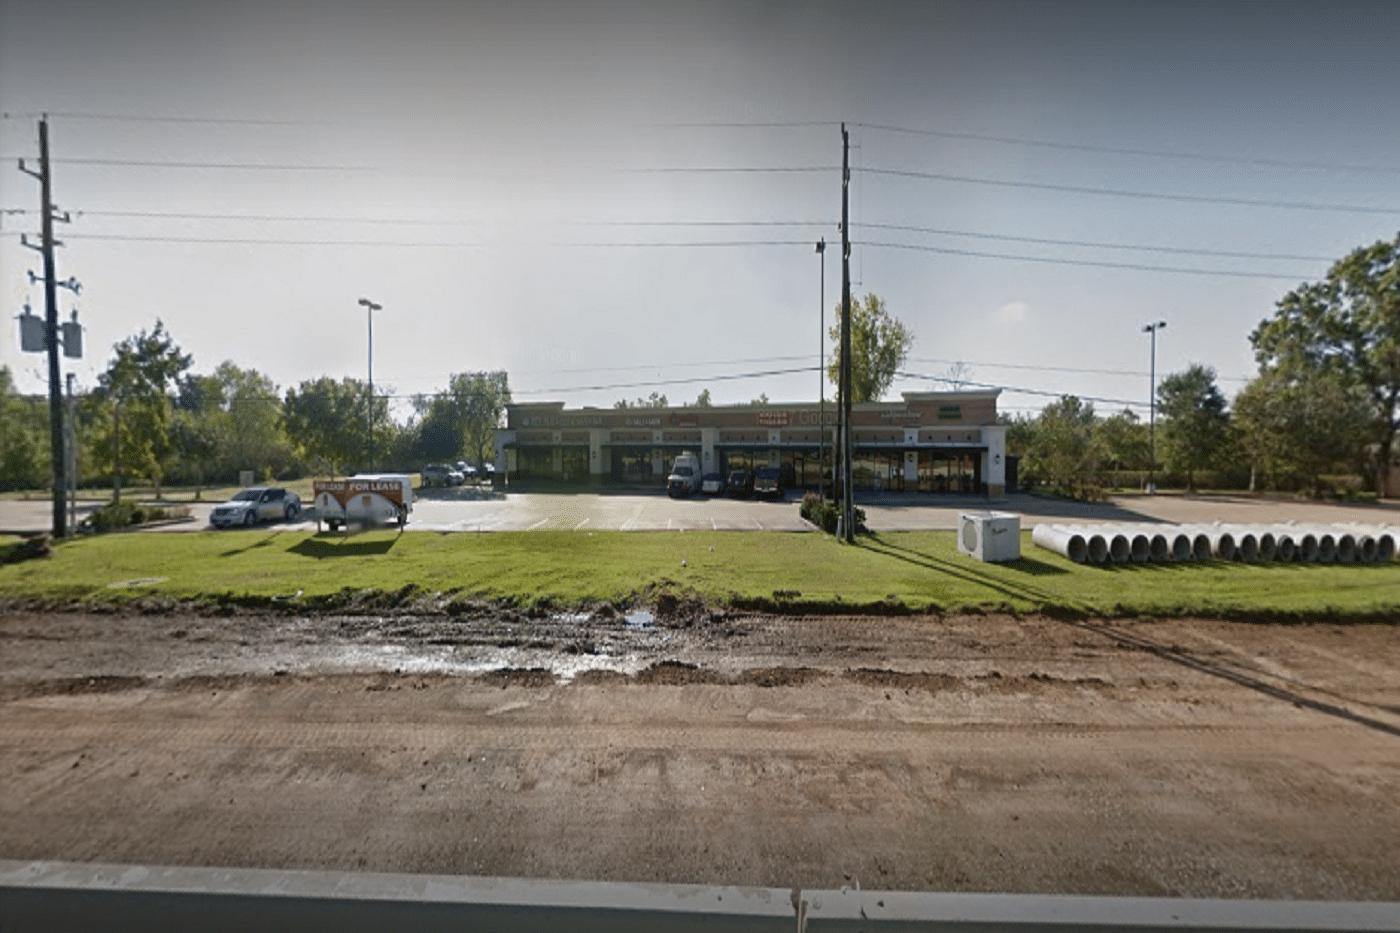 Grove Tavern,1410 E Highway 90A, Richmond, TX 77406 was cited for a Refilling Liquor Violation